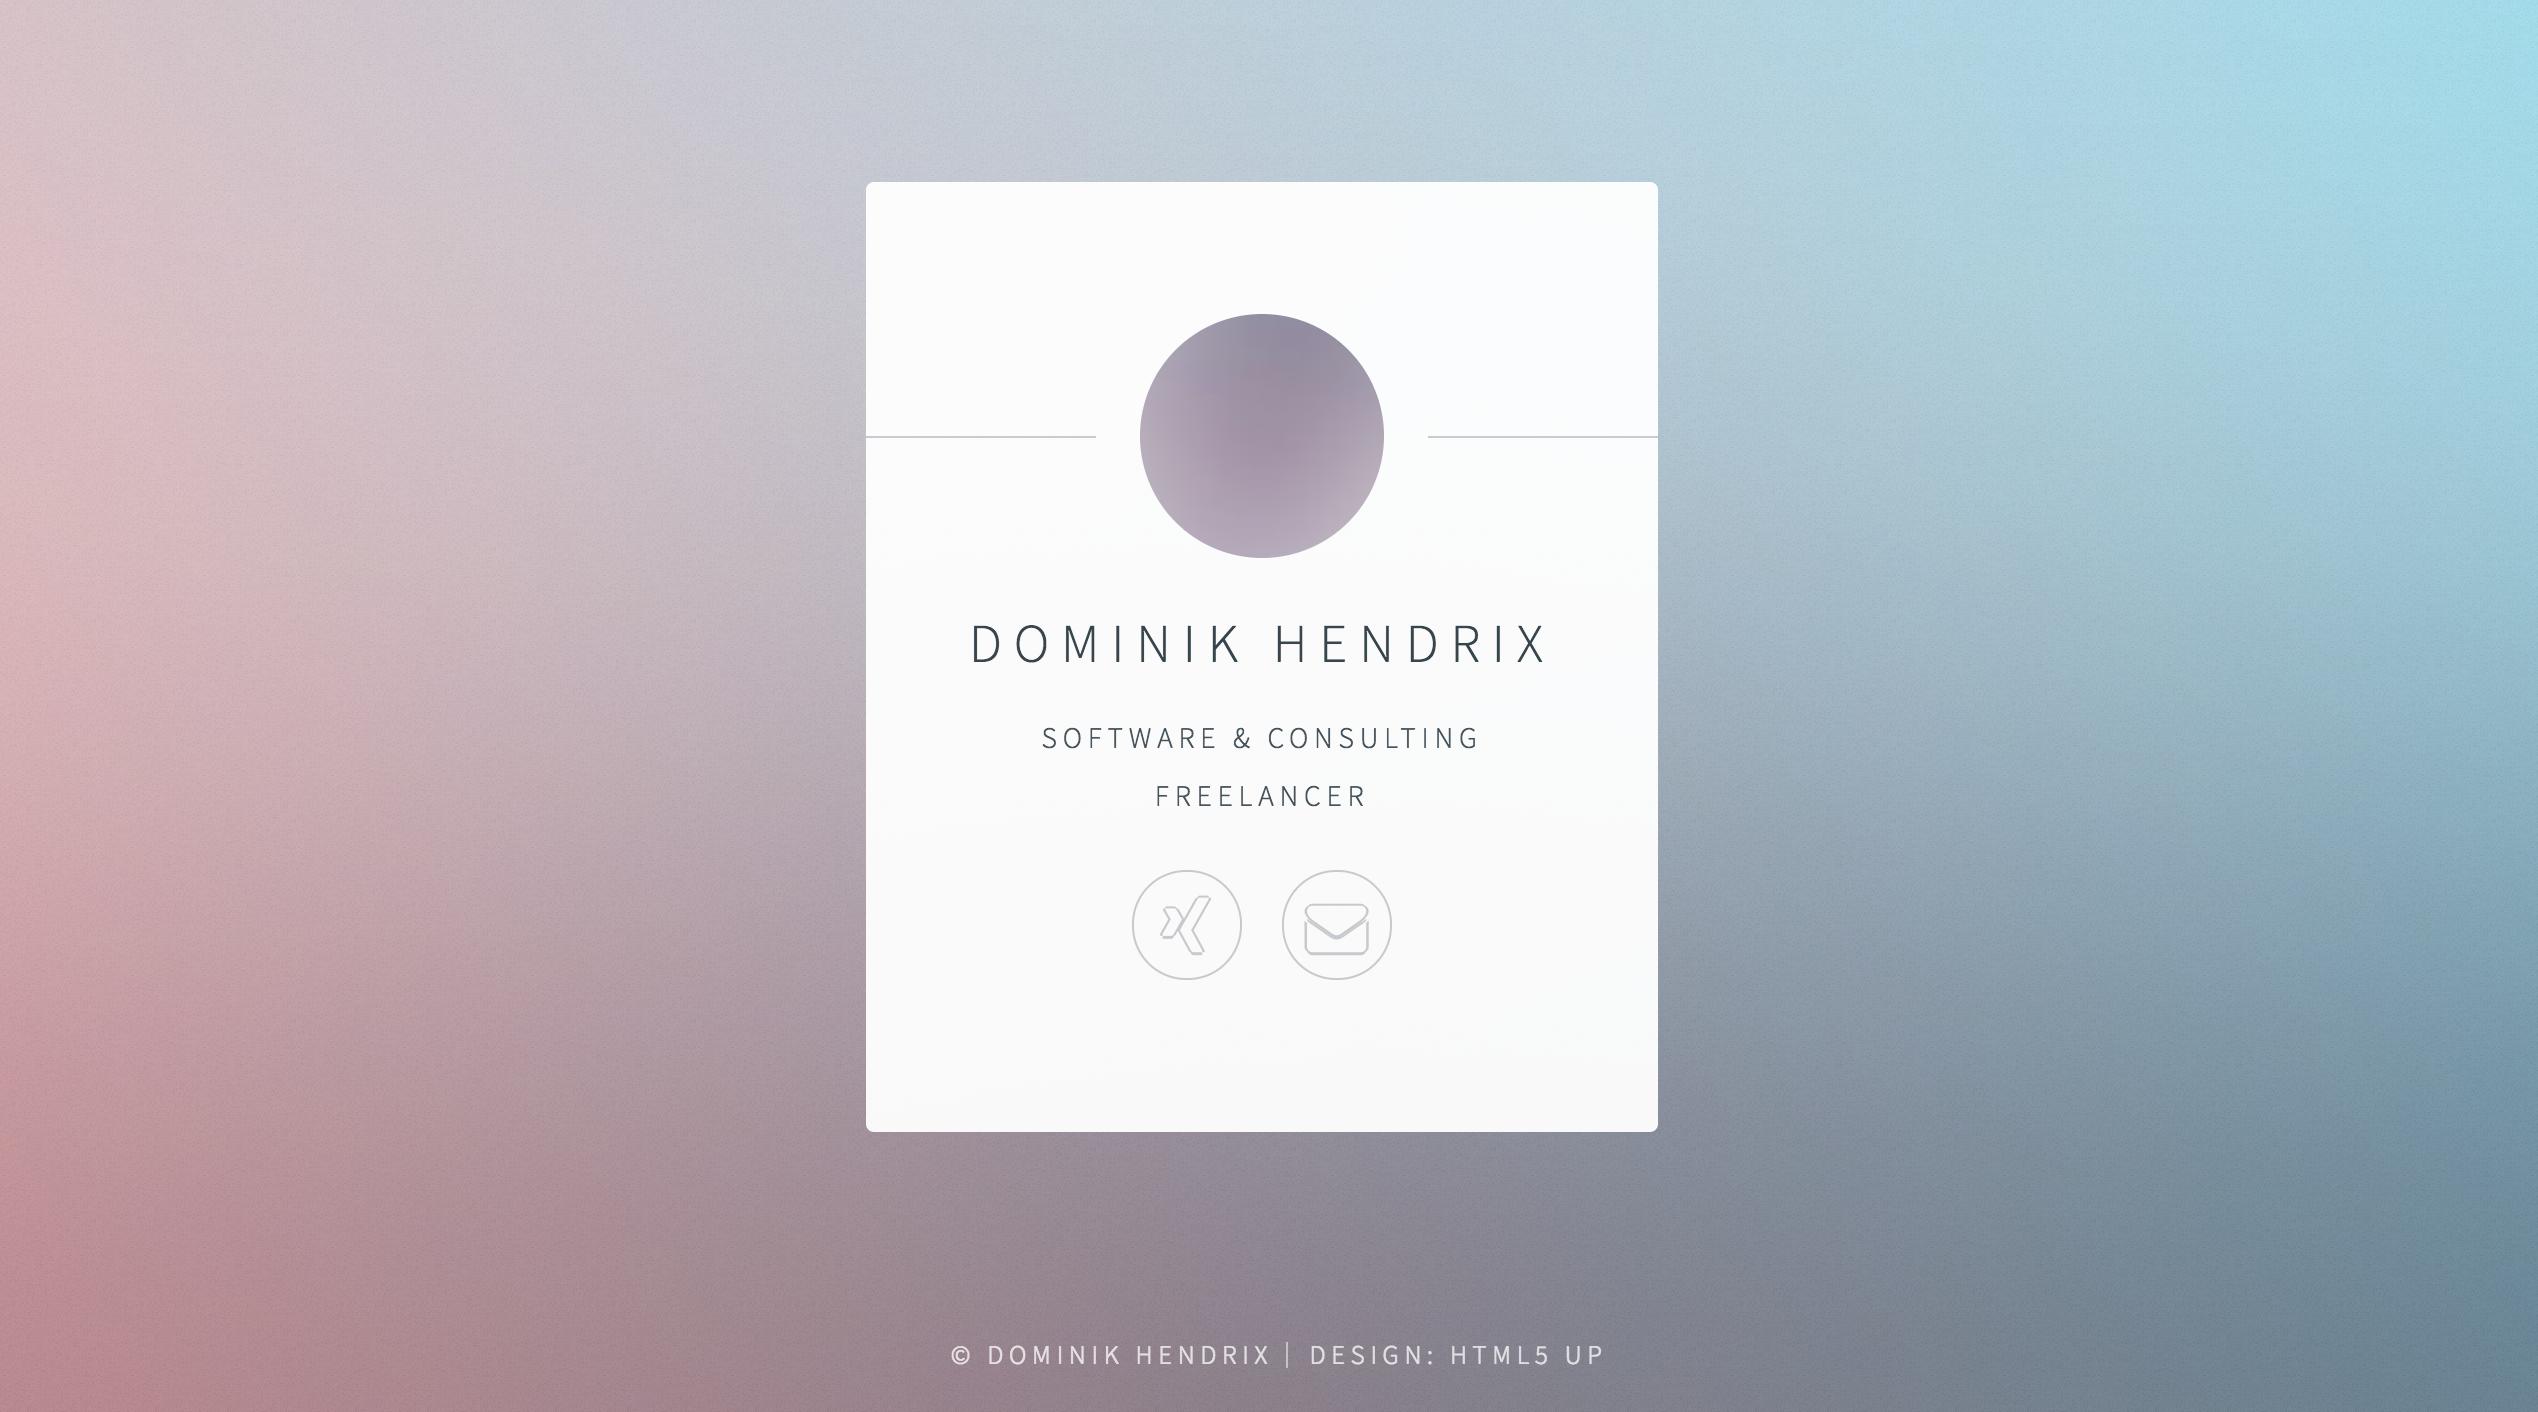 Dominik Hendrix - Freenlancer - Prgrammierung